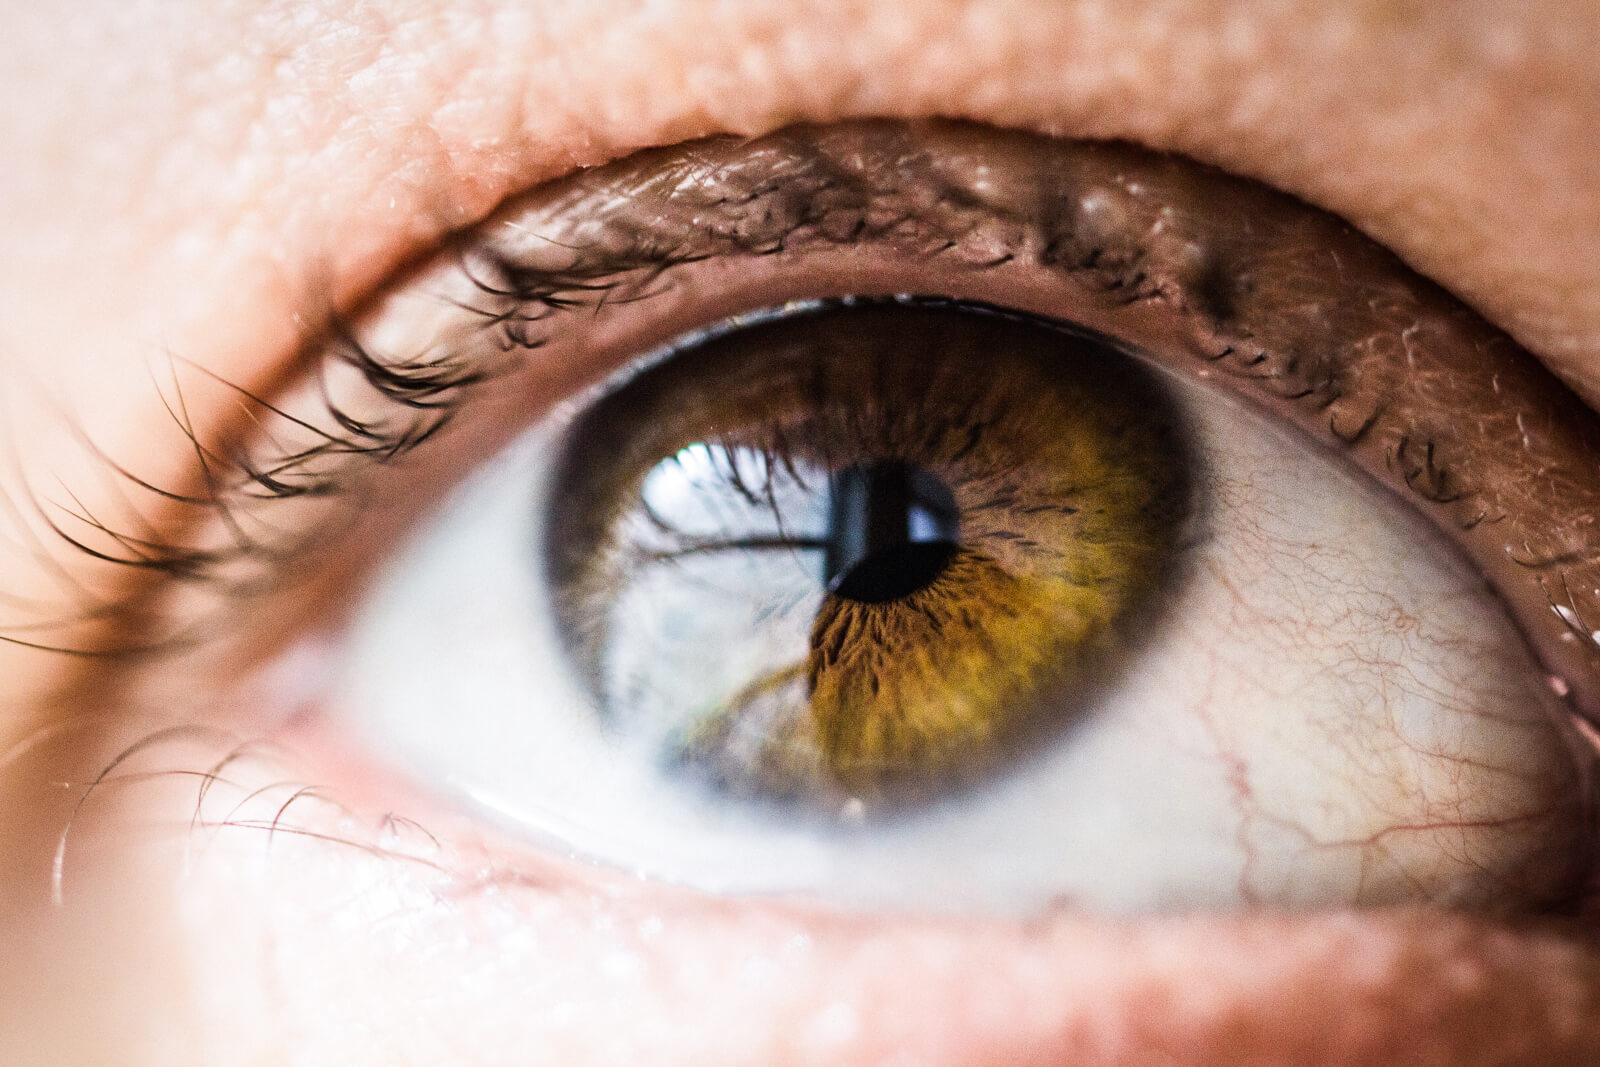 sensitive-eyes-makeup-remover-abloomnover.net_-1600x1067 Shopping for a sensitive eyes makeup remover?